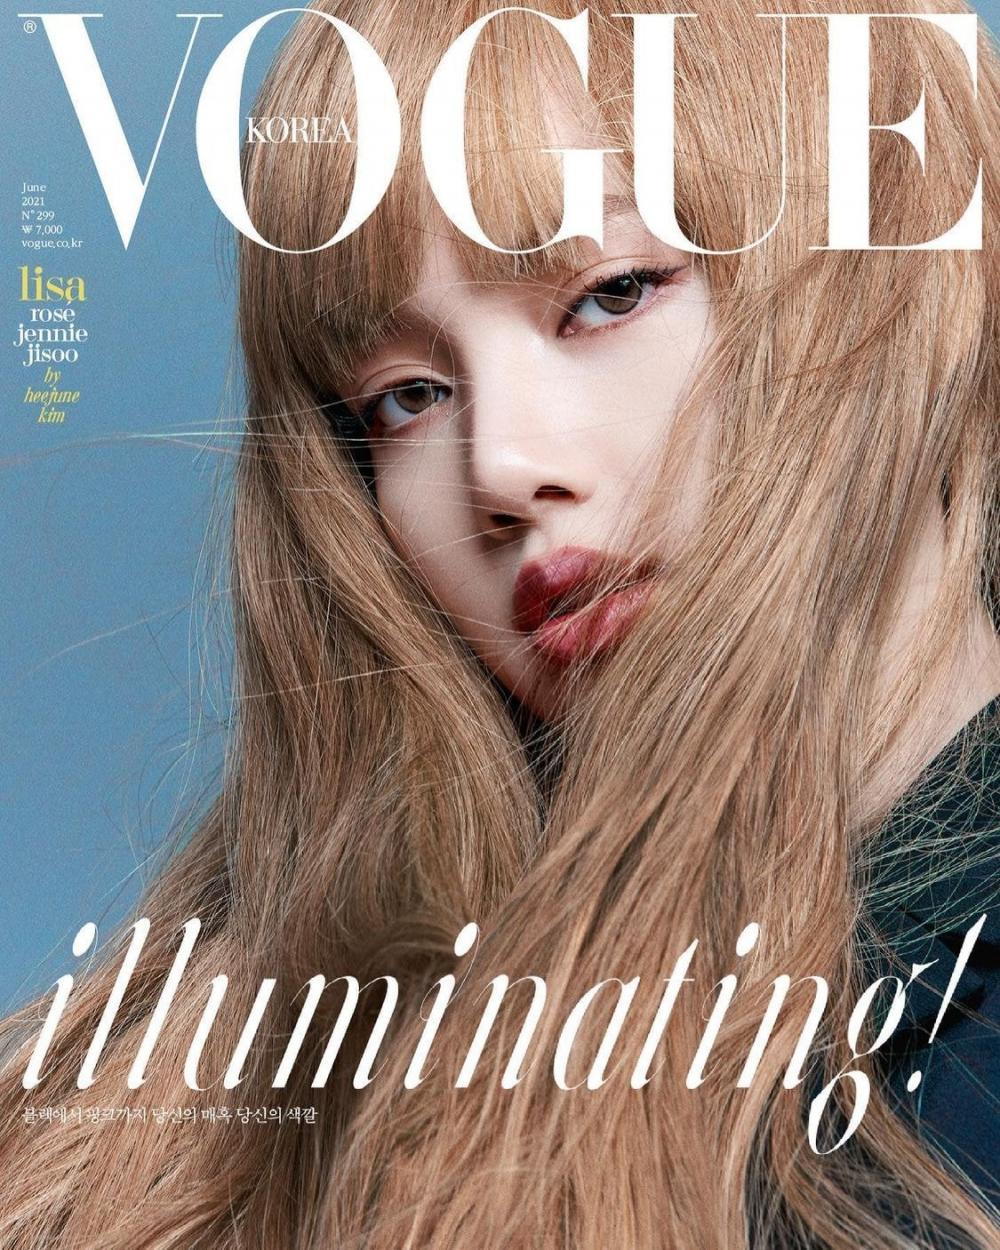 BLACKPINK Illuminate The Various Covers Of VOGUE Korea Magazine